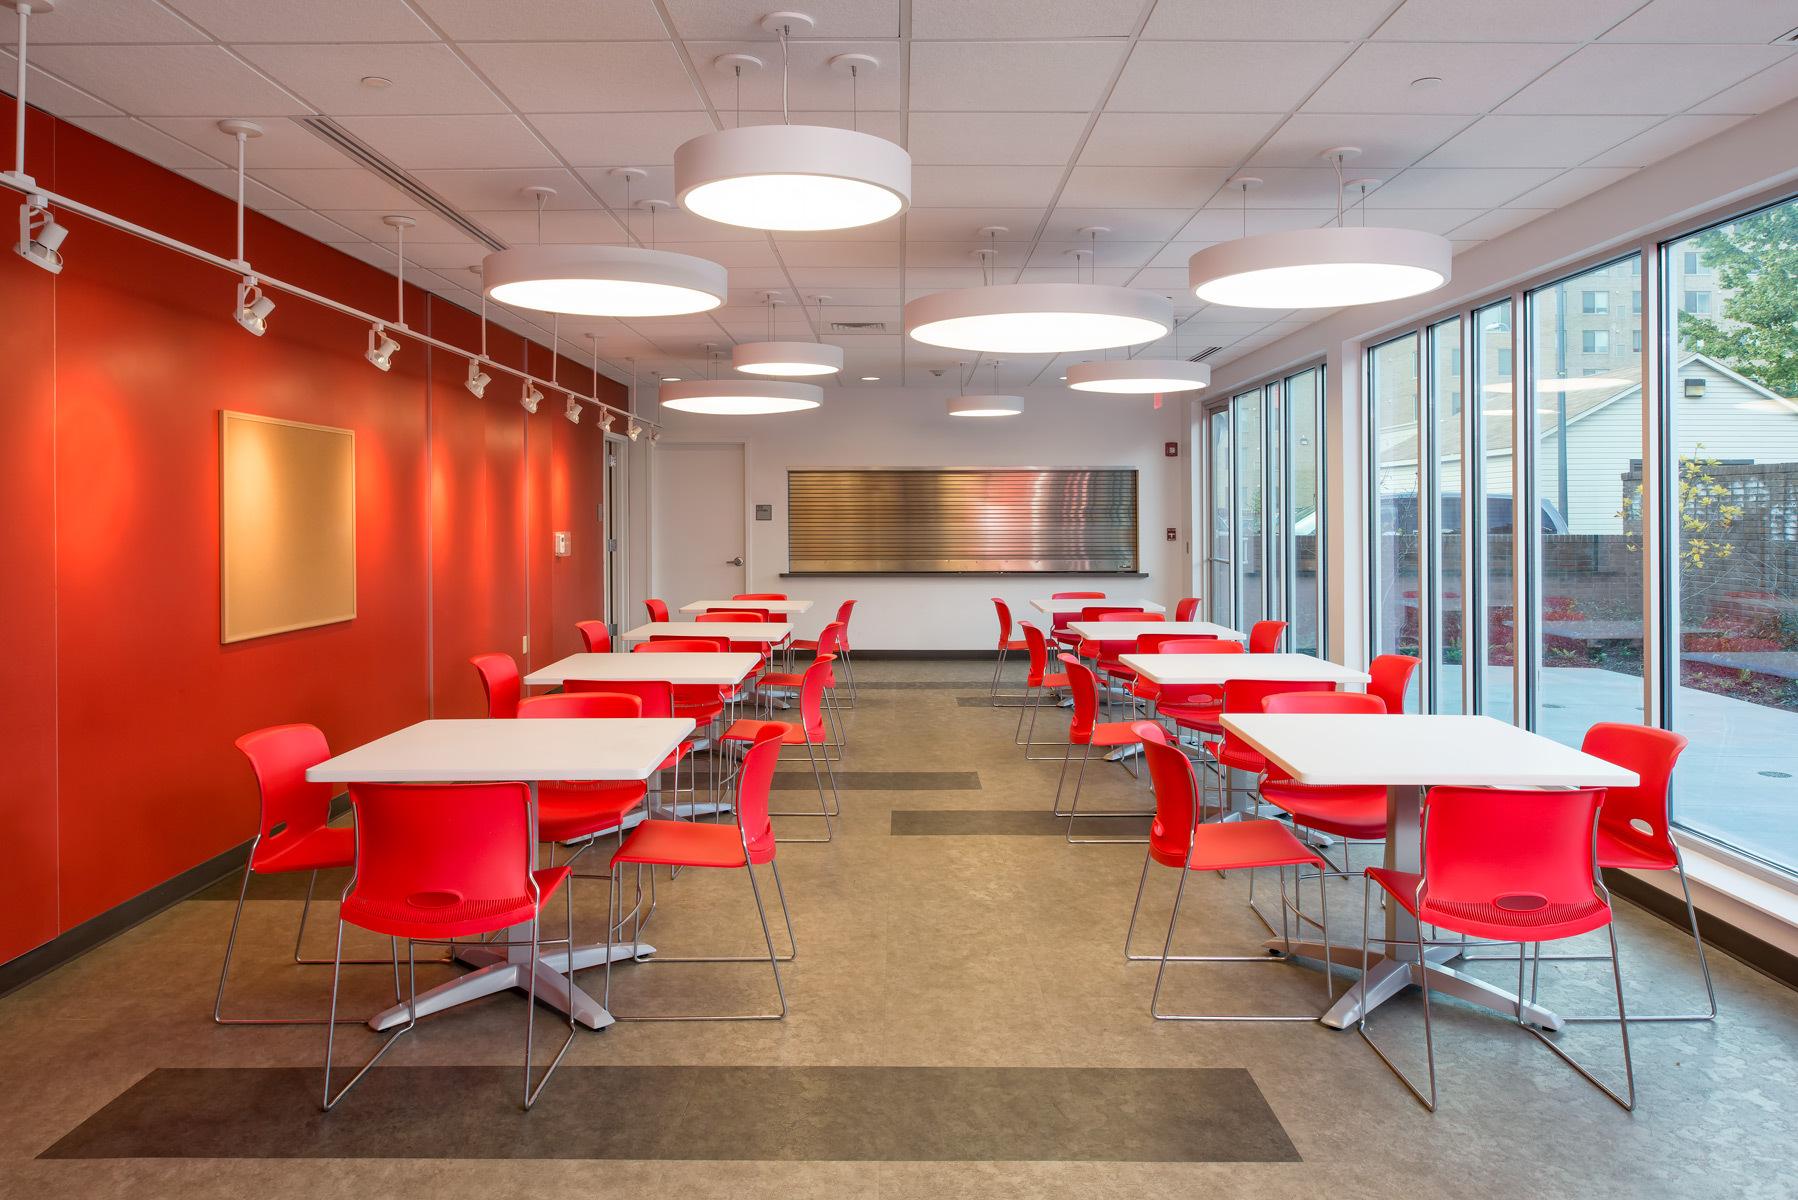 611 N. St., NW611 N. St.Washington, DCArchitect: CORE Architects